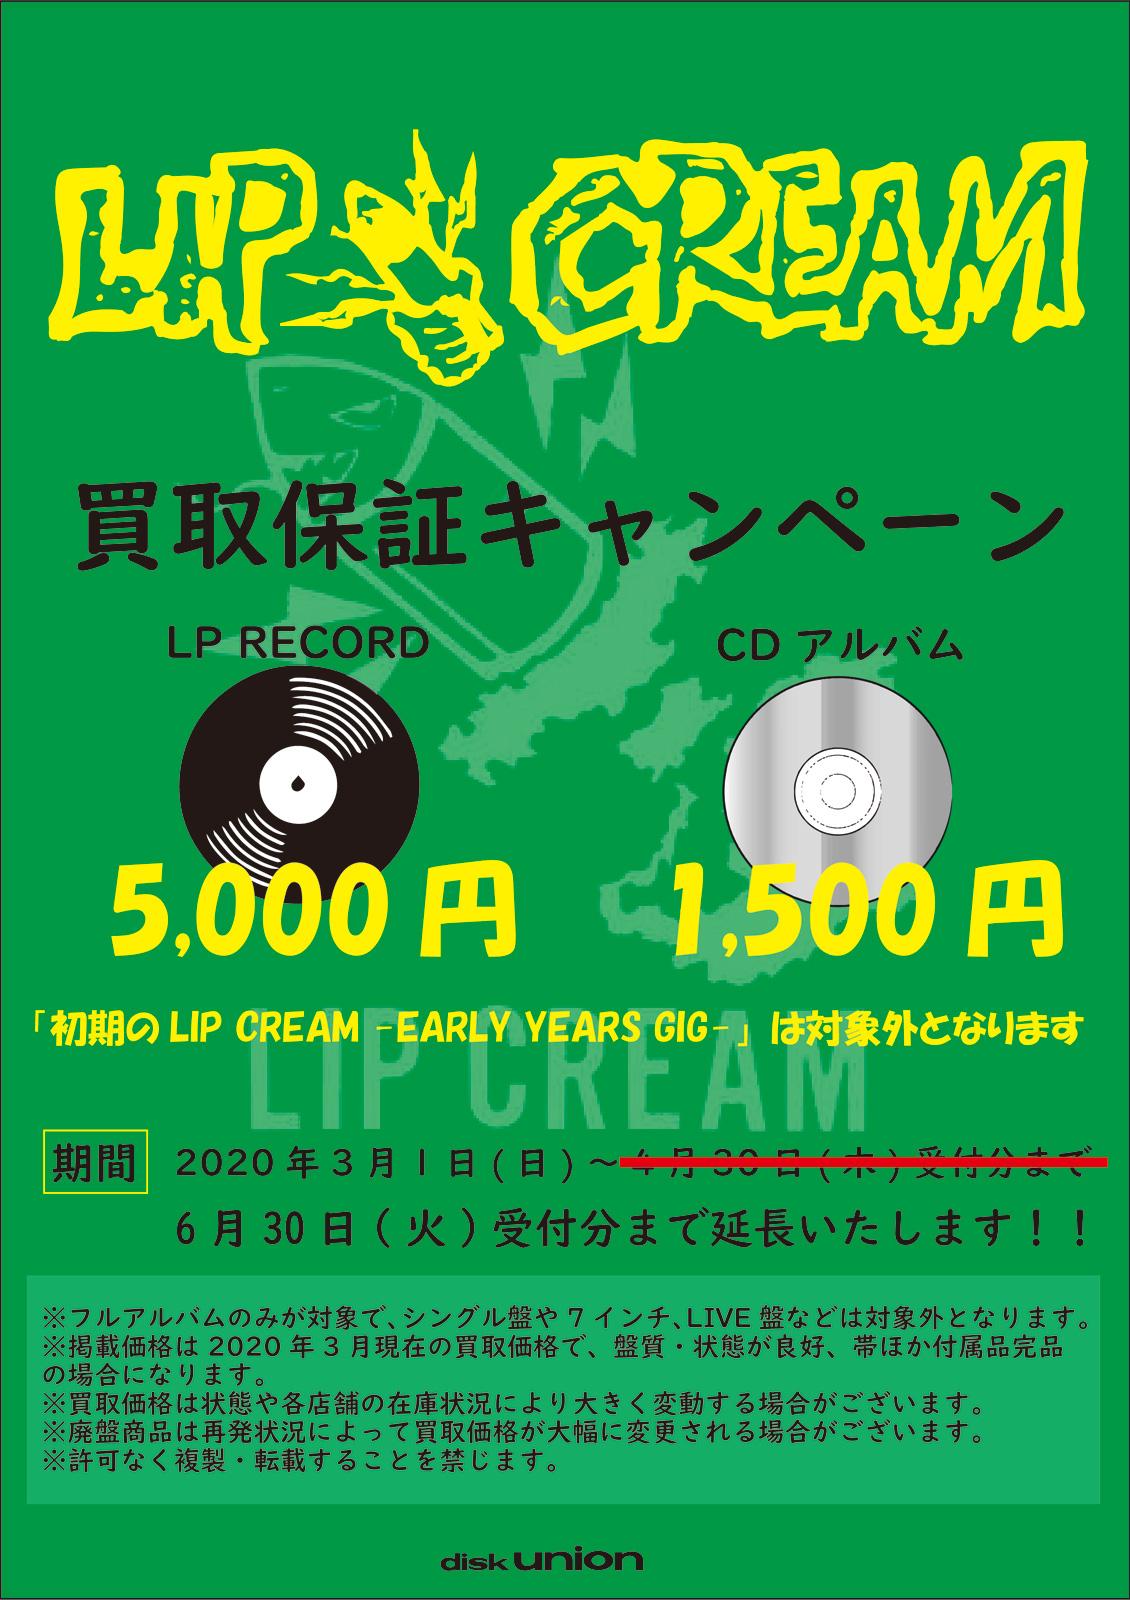 LIP CREAM買取保証 <6/30(火)まで延長決定>